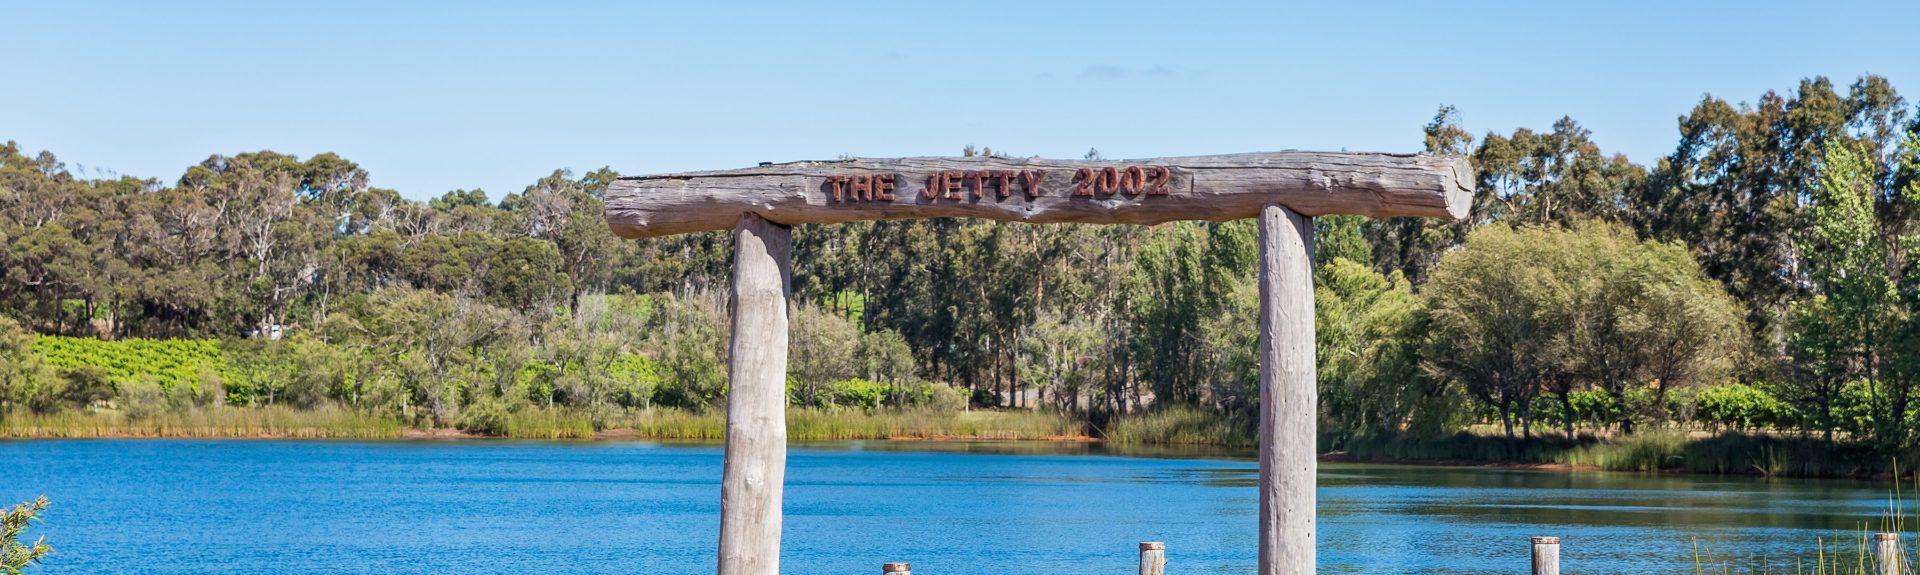 Treeton, Australie-Occidentale, Australie